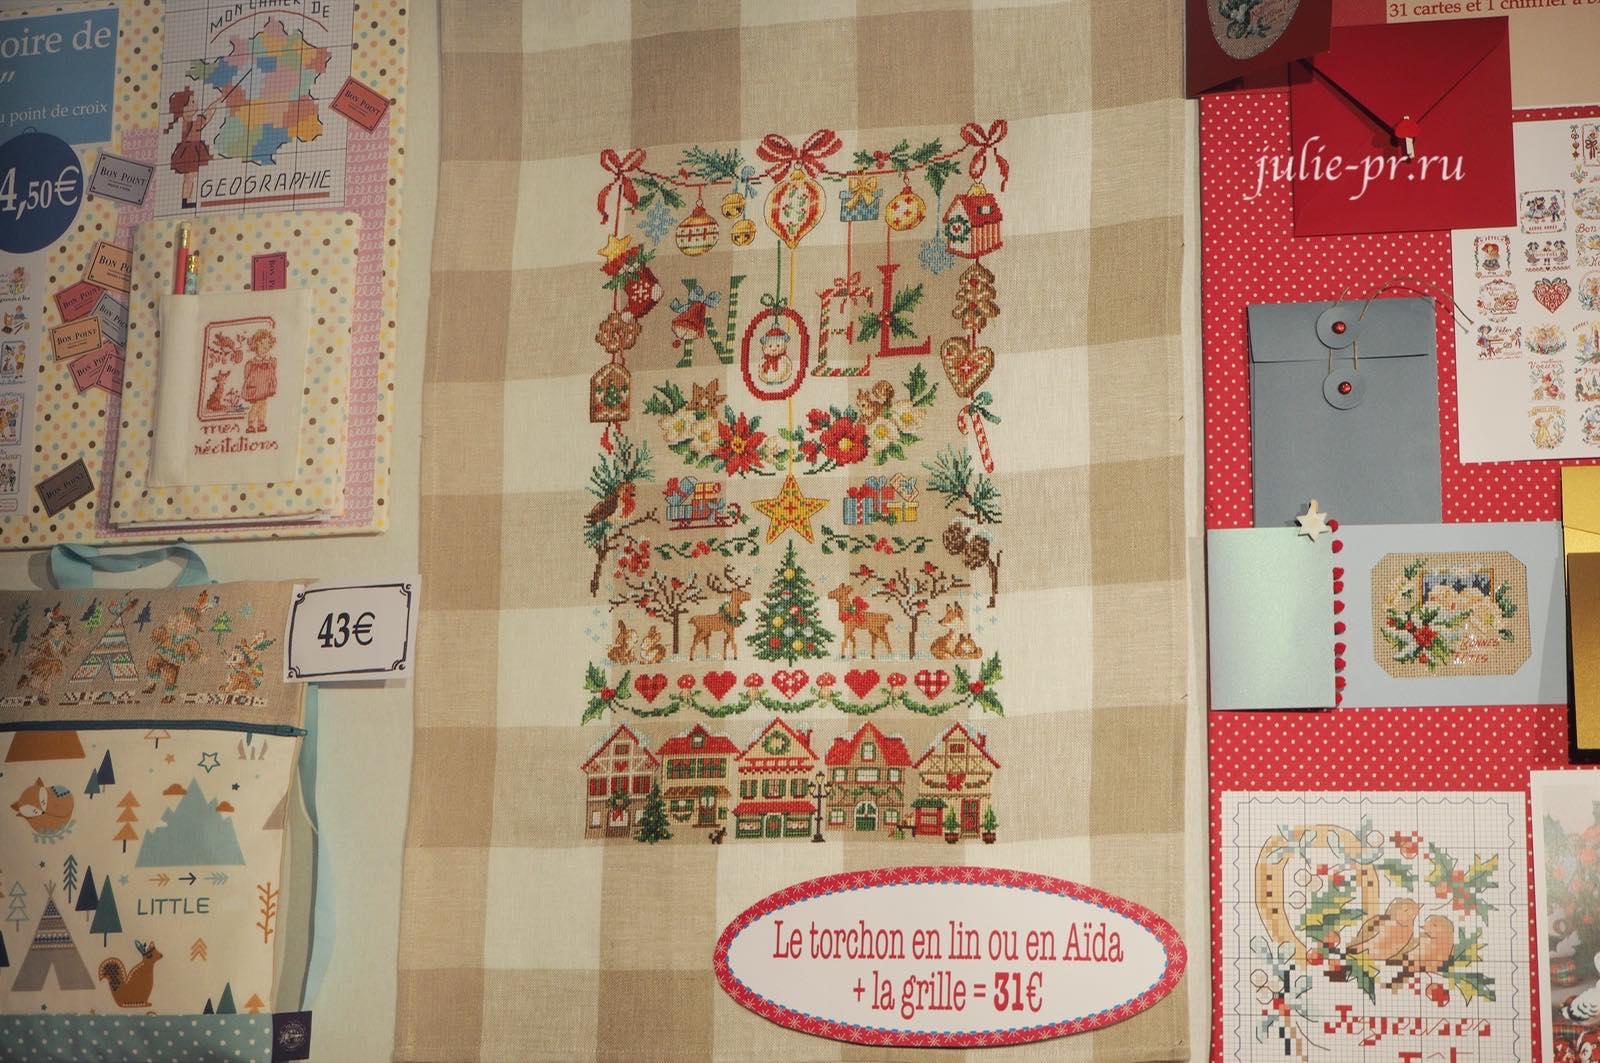 полотенце Imagier de Noel, вышивка крестом, Les brodeuses parisiennes, Veronique Enginger, Парижские вышивальщицы